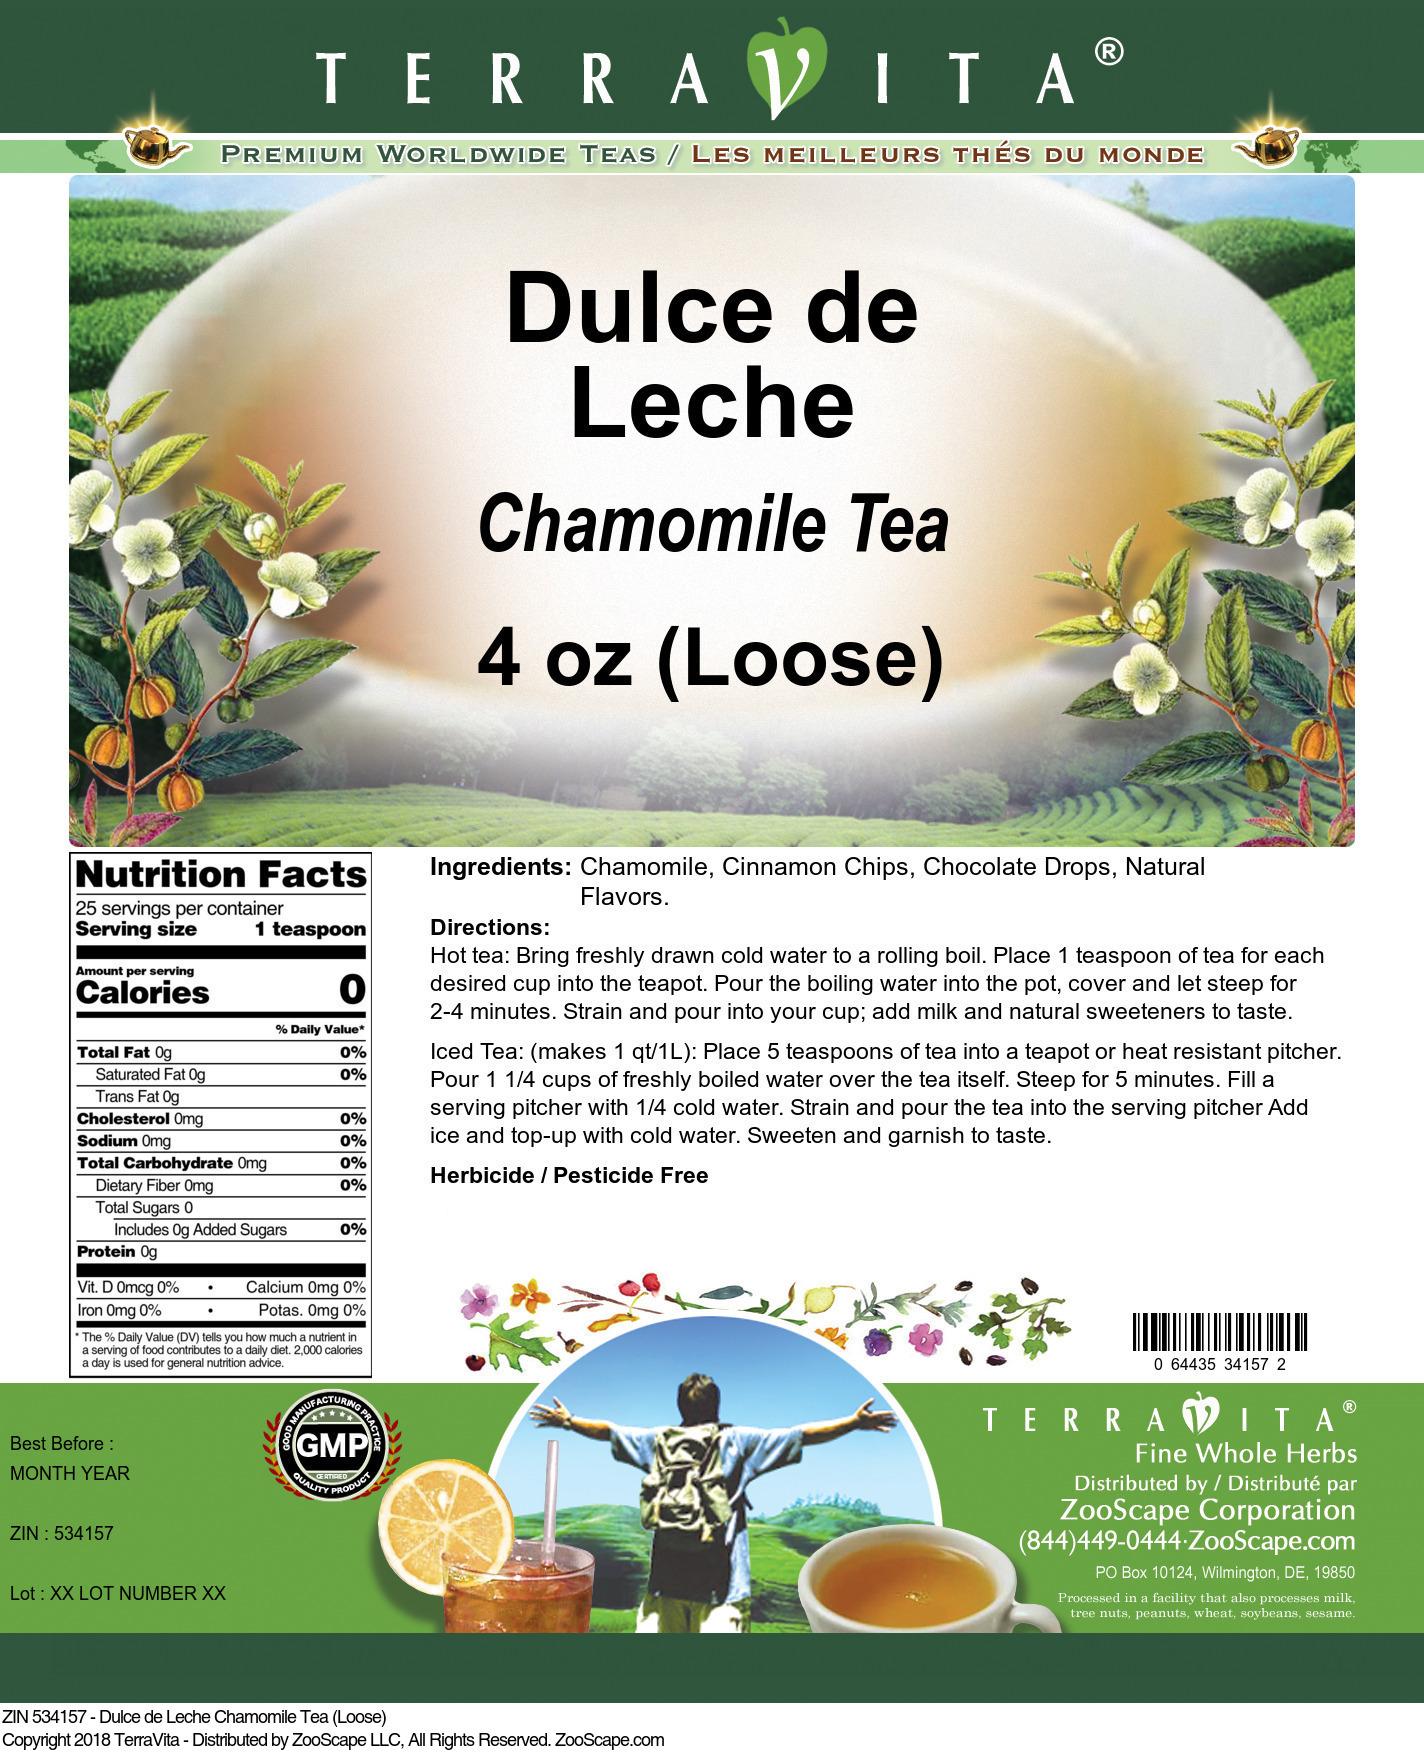 Dulce de Leche Chamomile Tea (Loose)